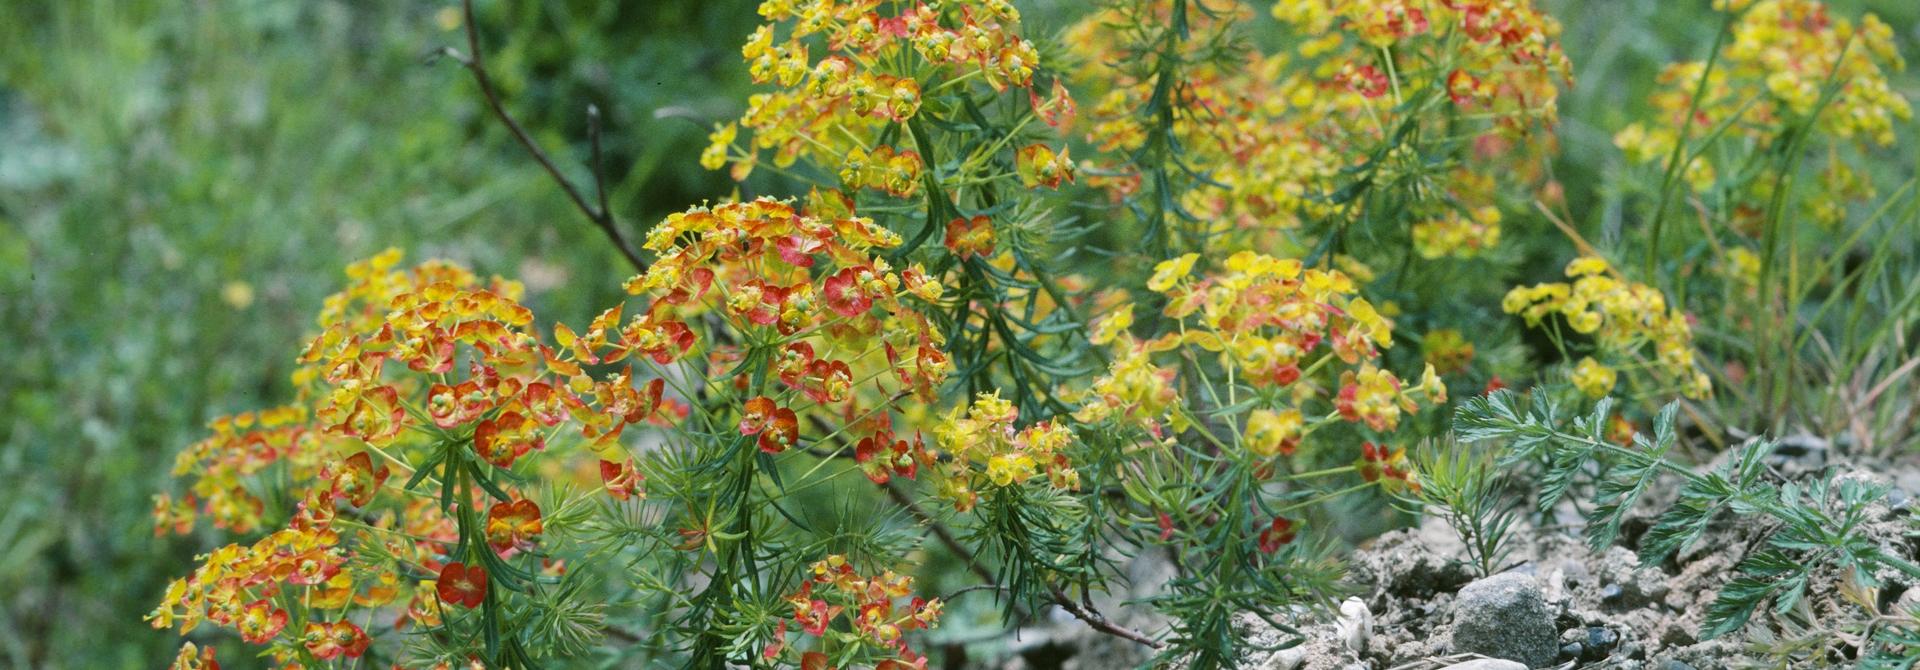 abblu00fchende Zypressenblu00e4ttrige Wolfsmilch (Euphorbia cyparissias). (Entomolgie/Botanik, ETH Zu00fcrich, Foto Albert Krebs)>